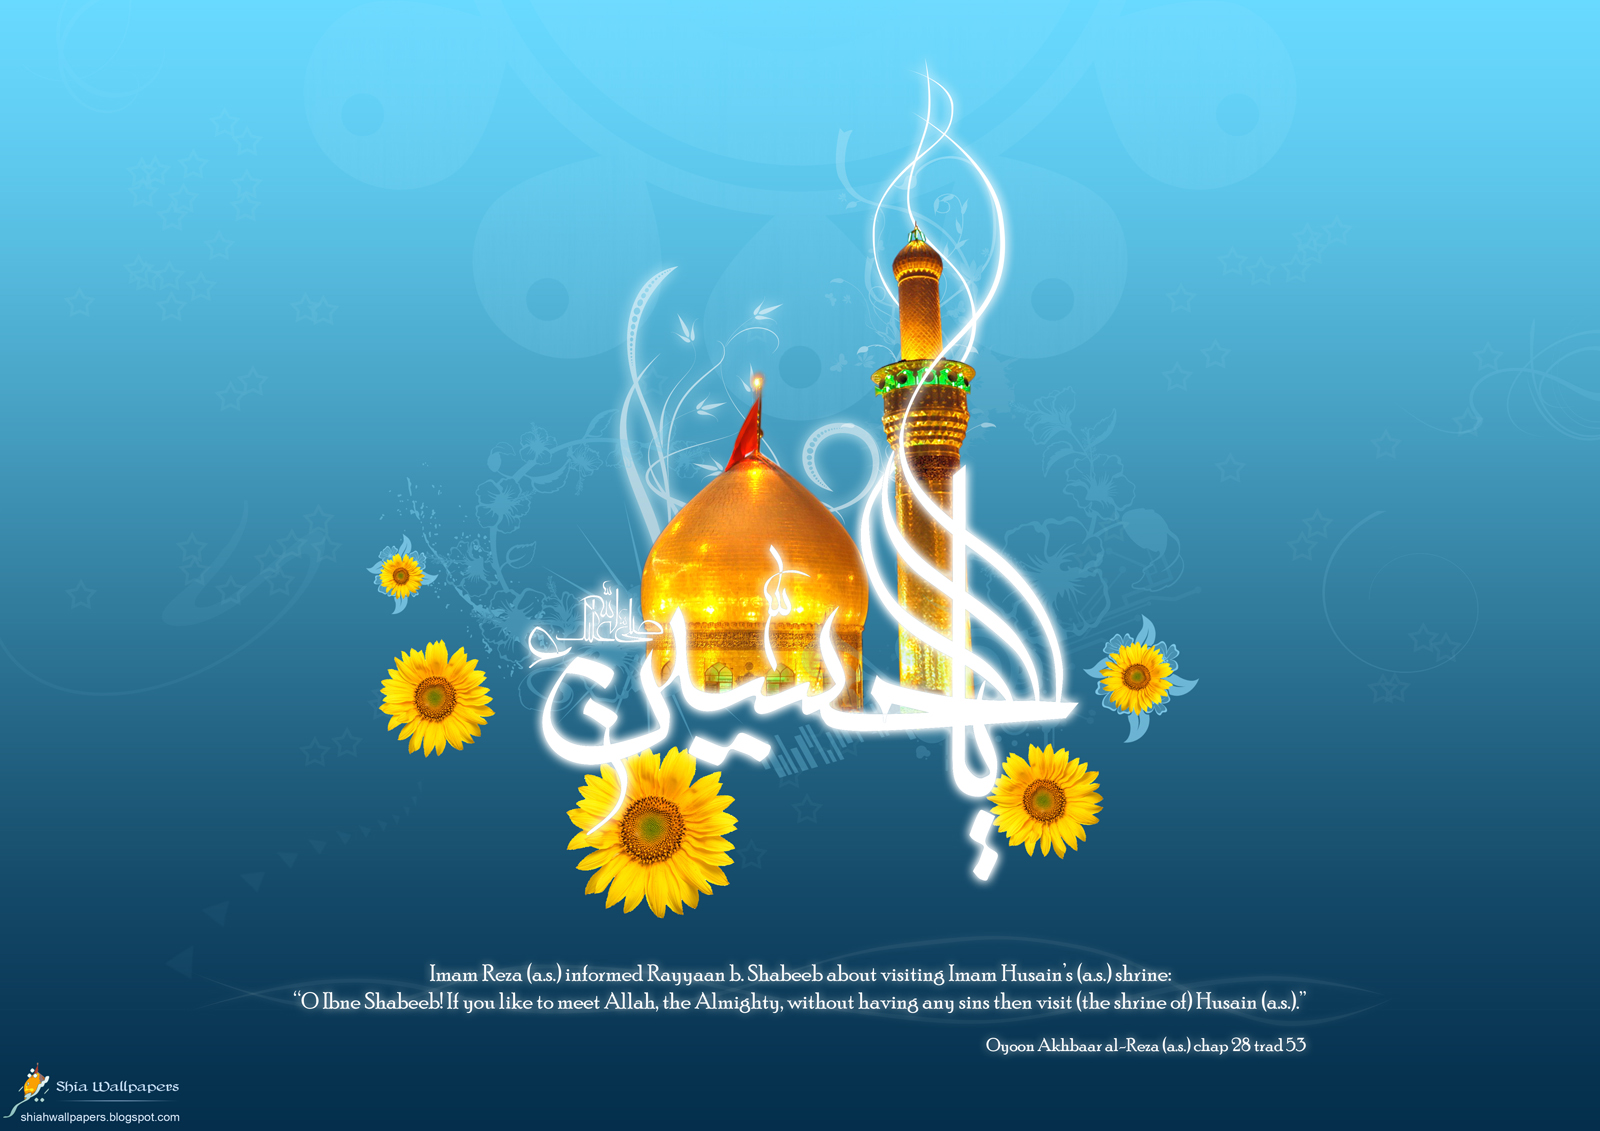 Maula Ali Shrine Wallpaper: Shia Wallpapers: Imam Hussain